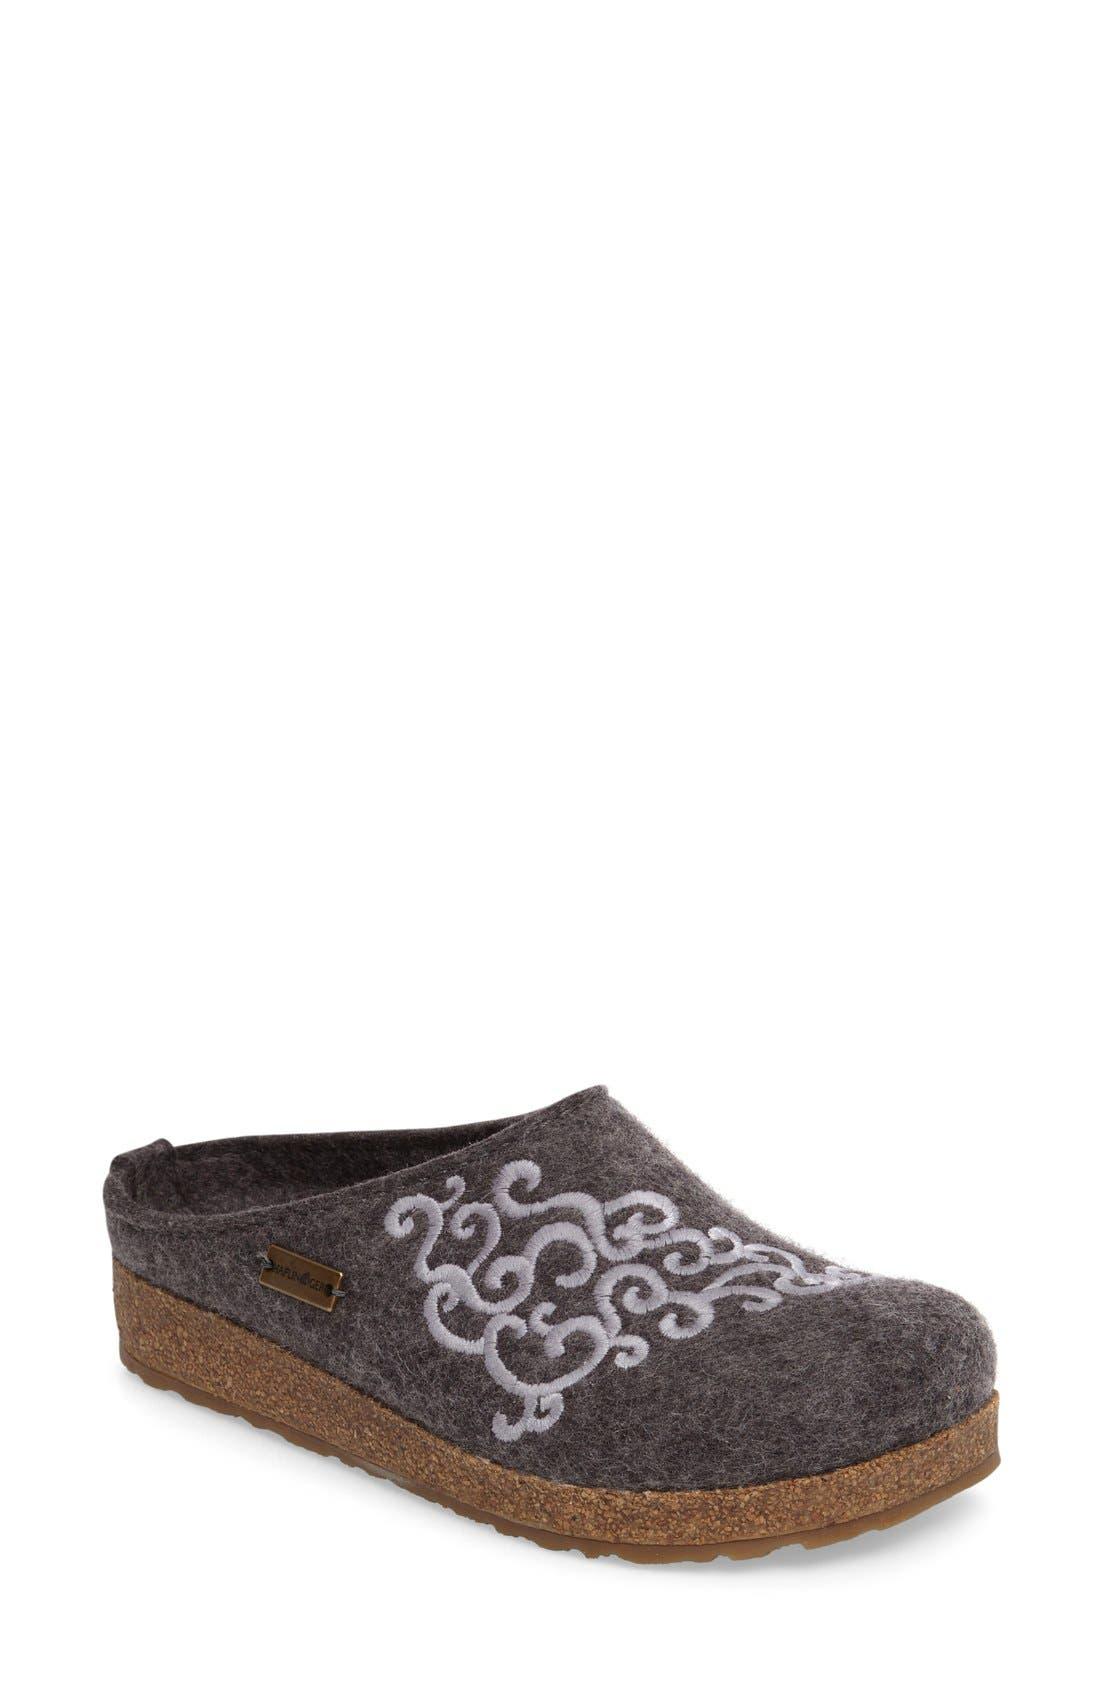 Symphony Slipper,                         Main,                         color, Grey Wool